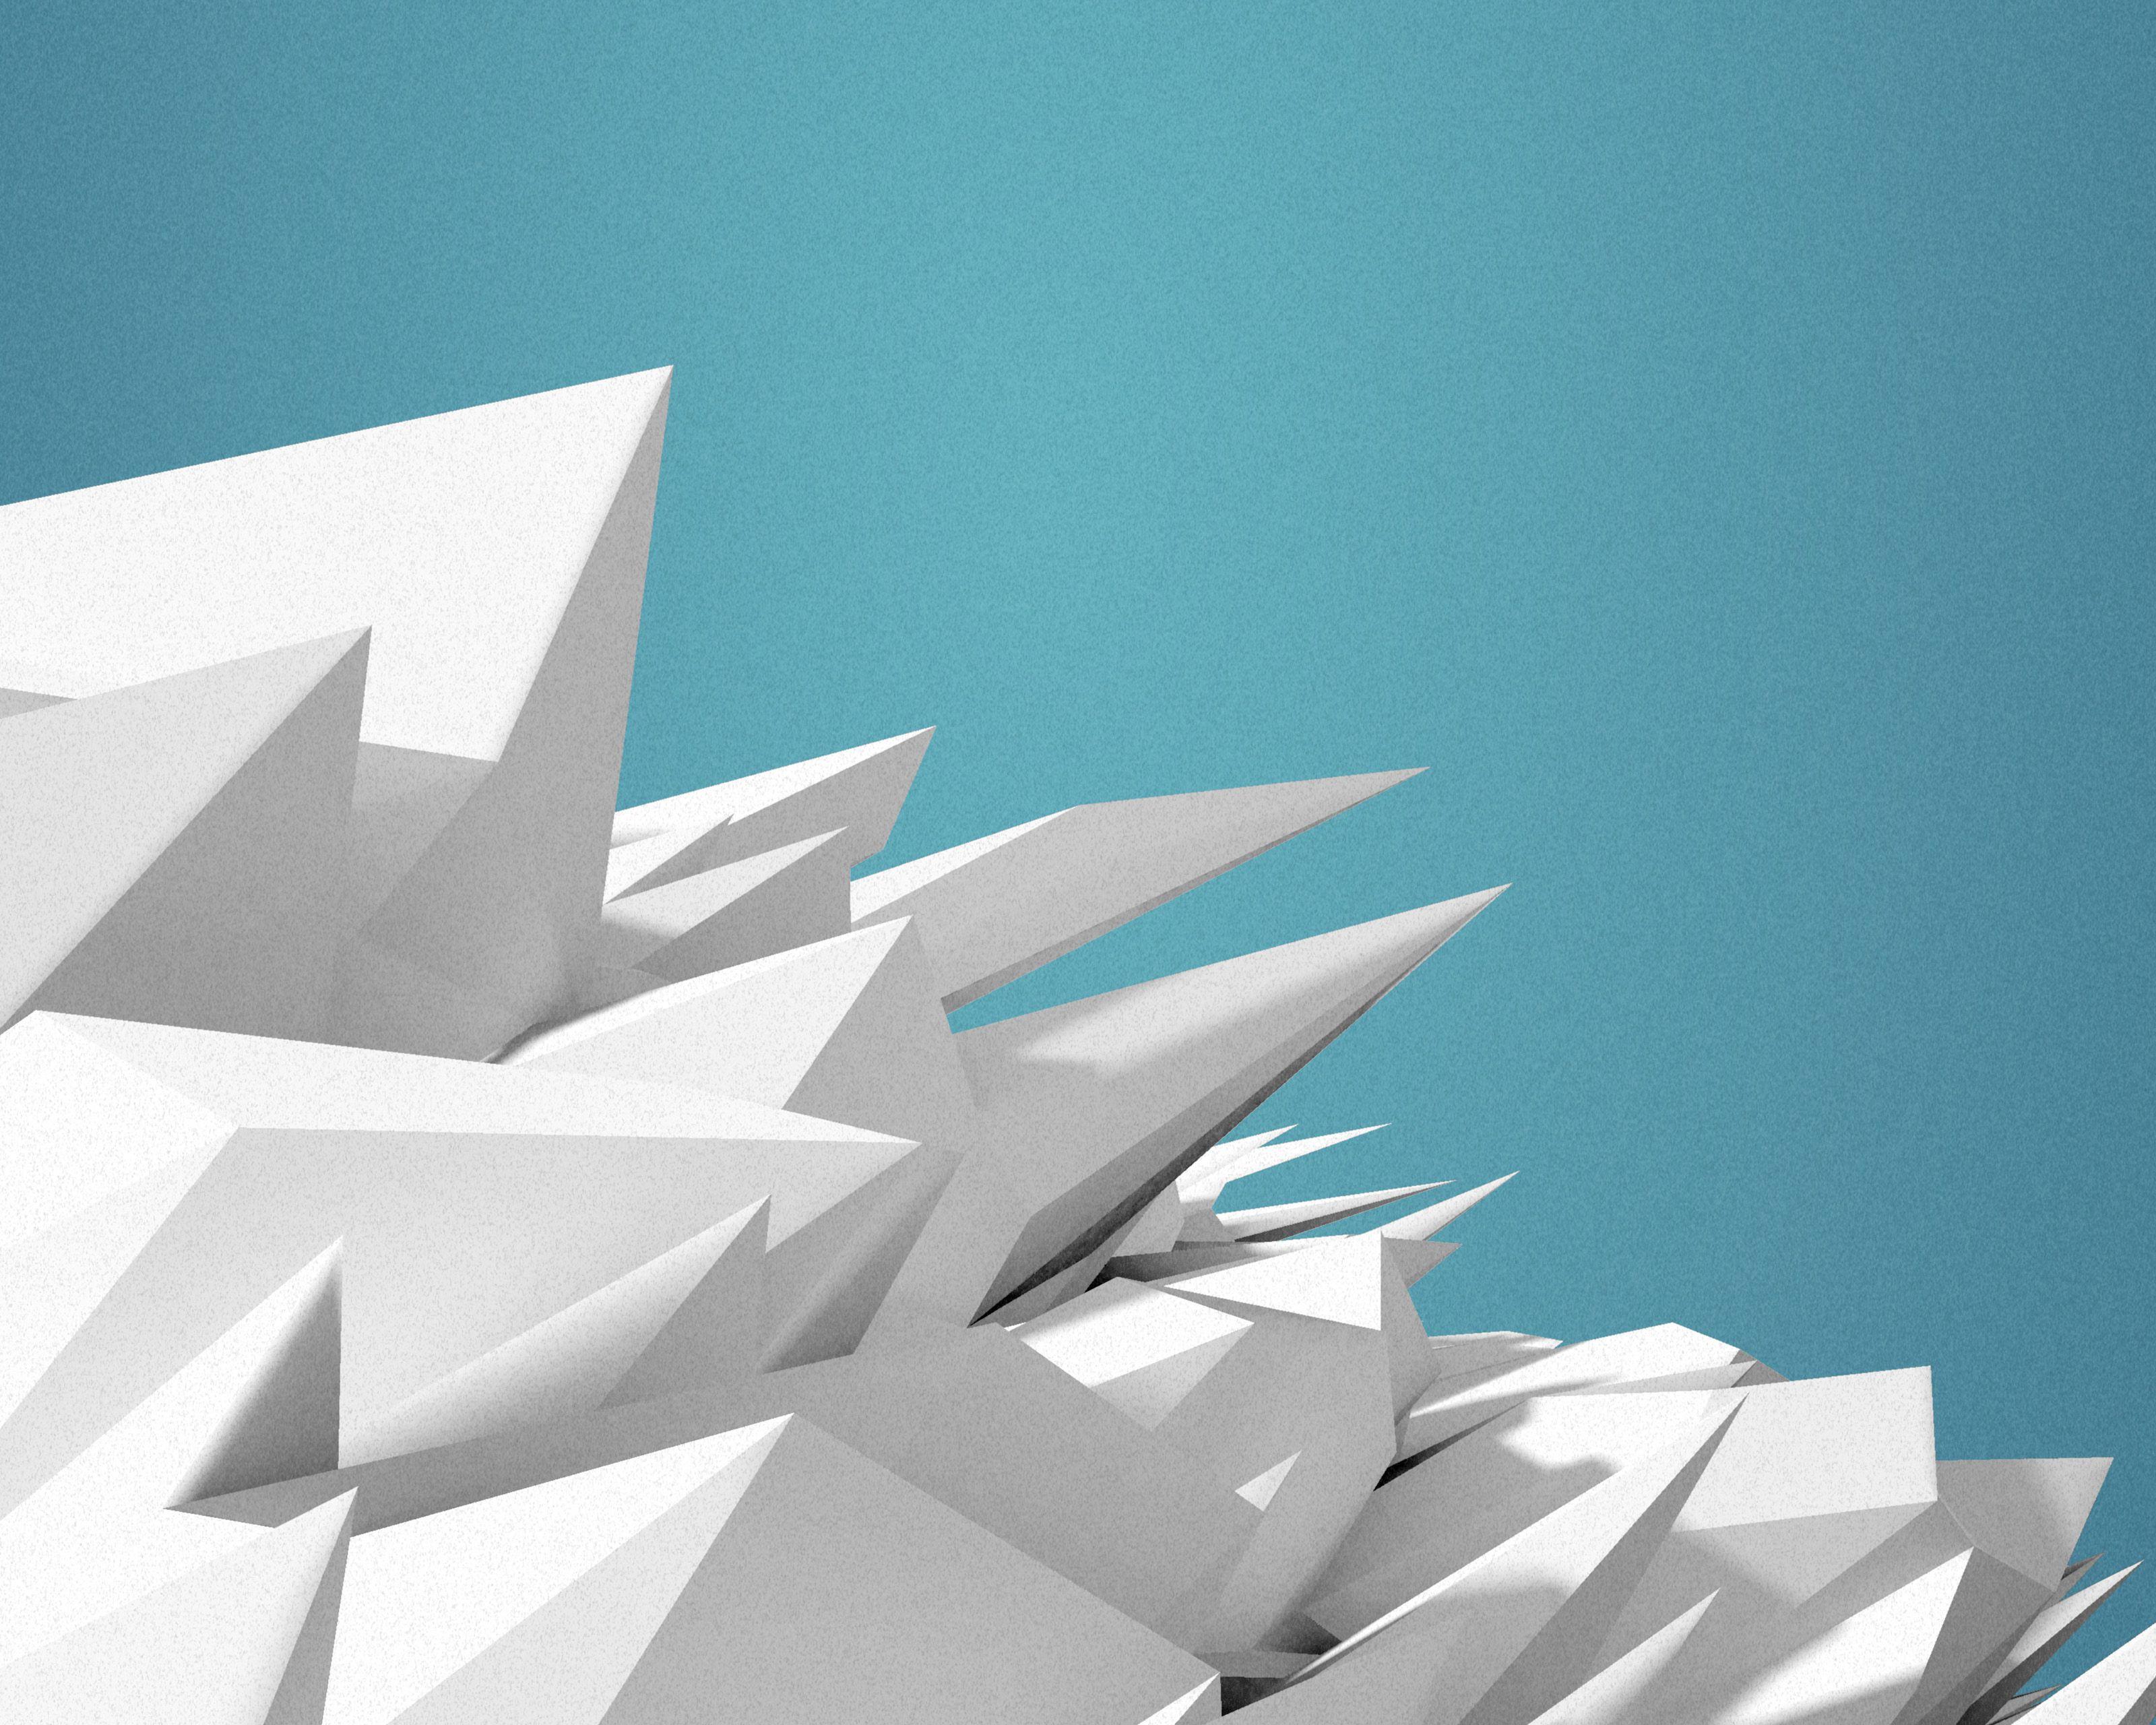 4k Material Design Wallpapers Nate Wren Graphic Design